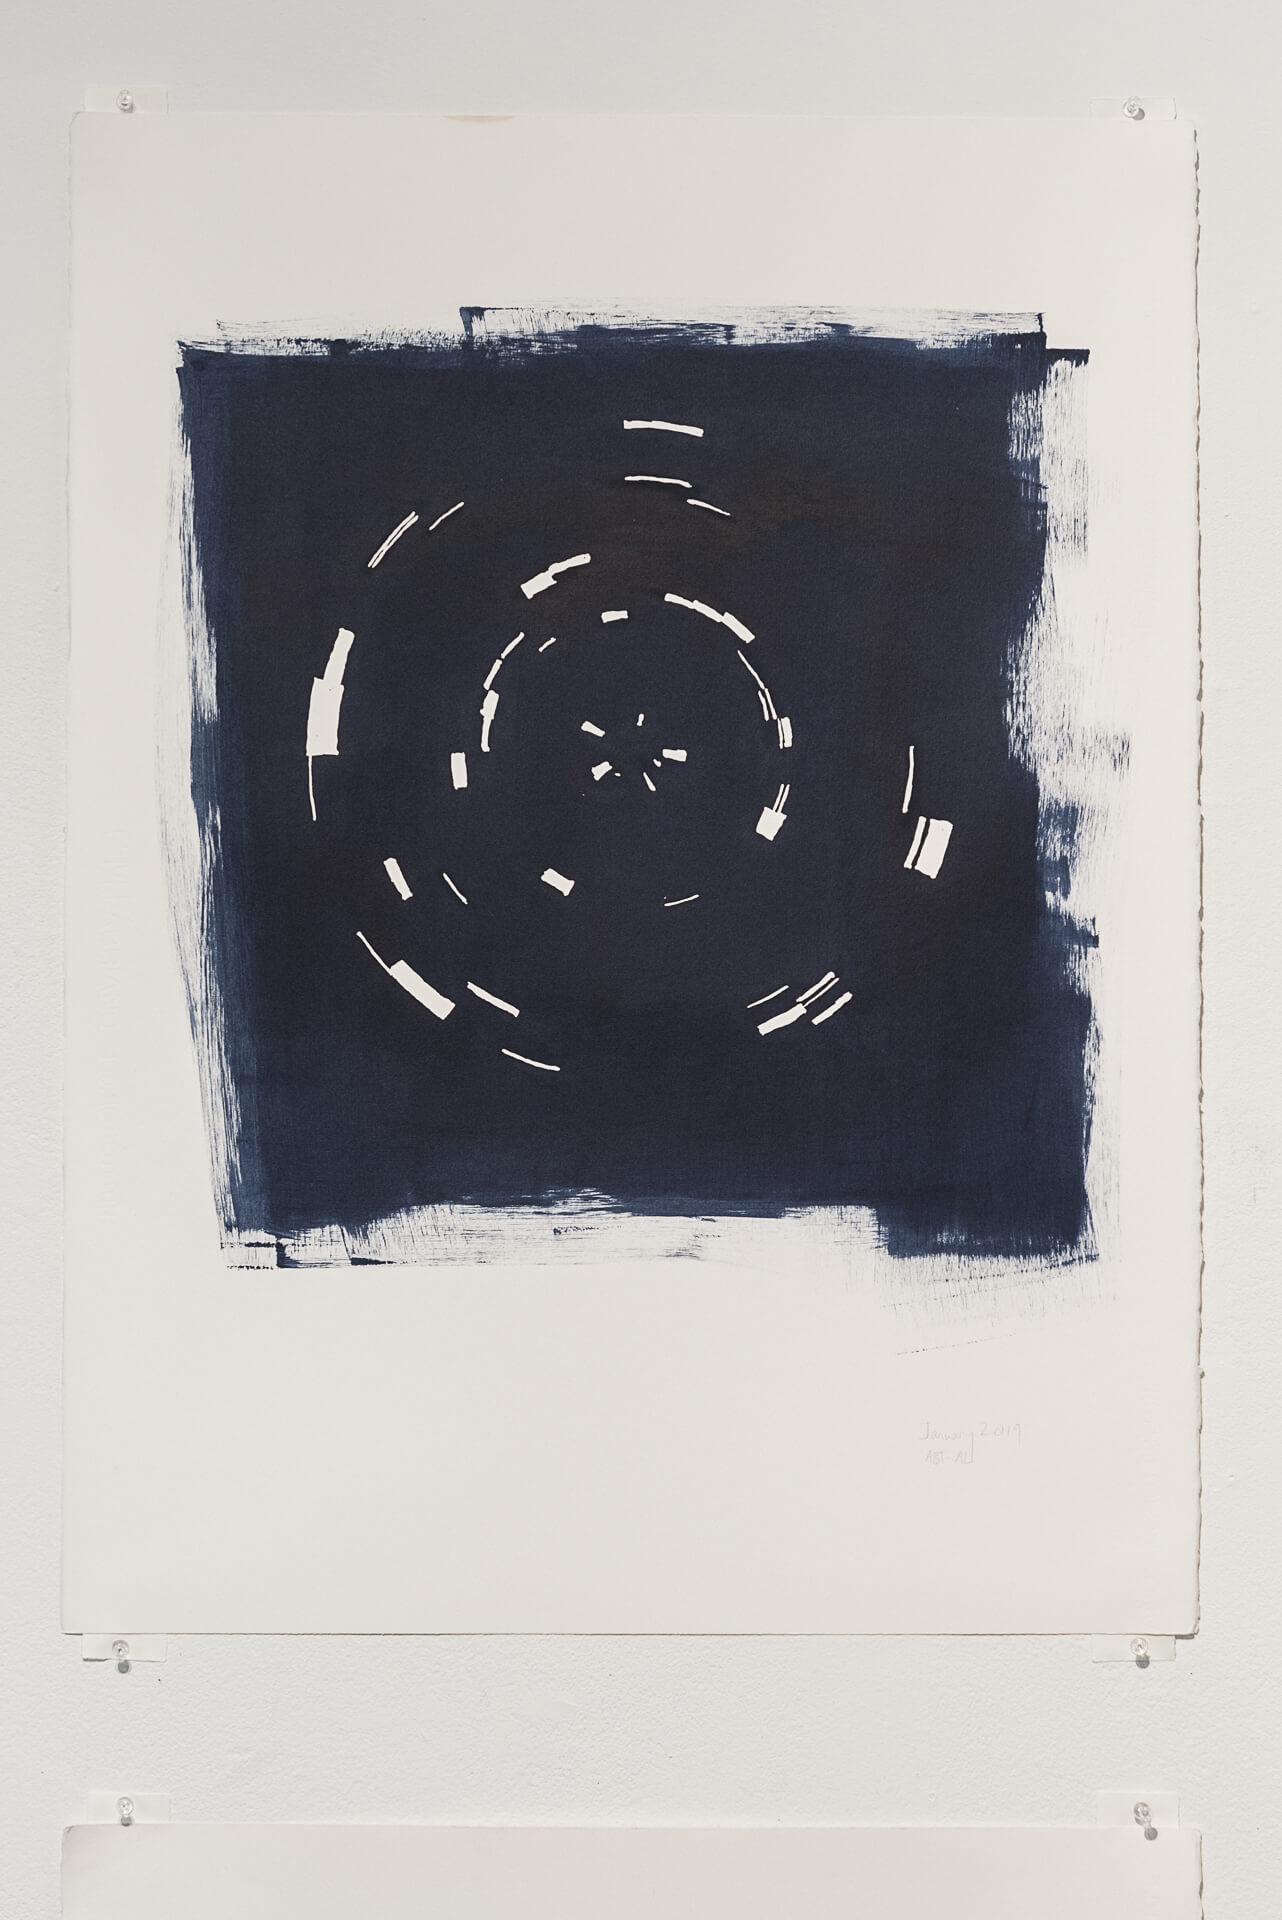 Indigo January 2019   Acrylic on paper, 30 x 22 inches